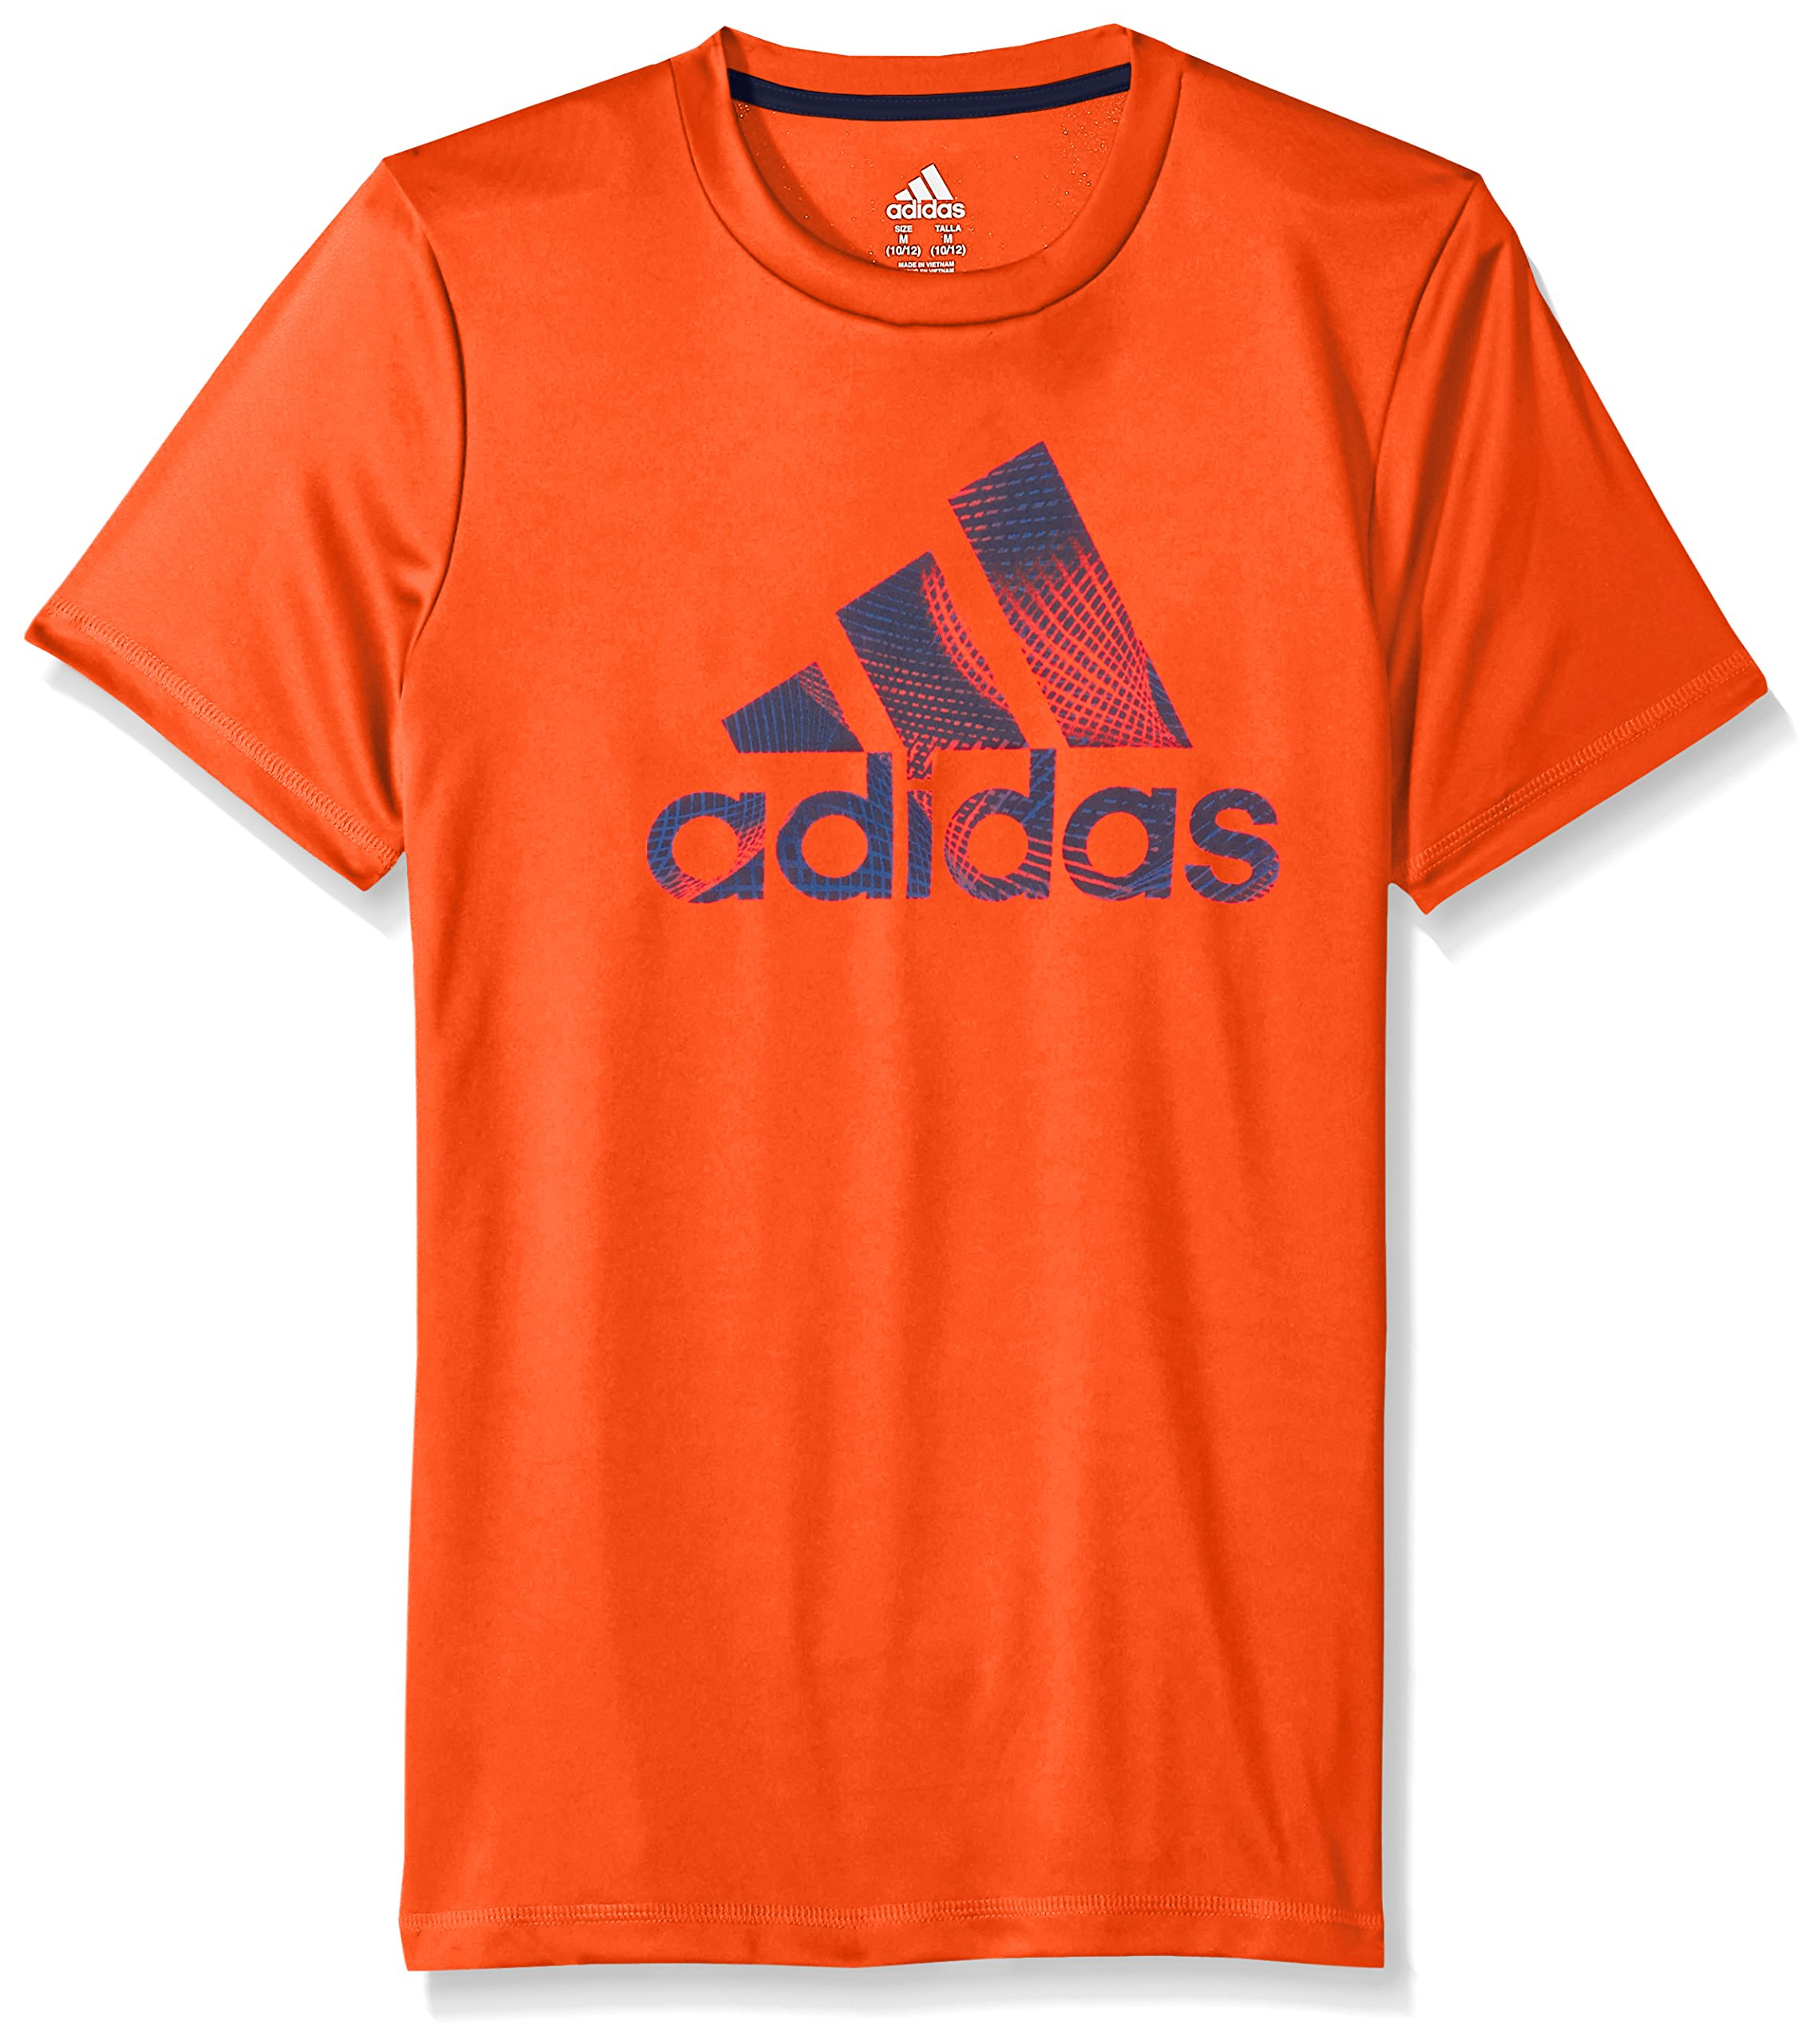 Adidas Boys' Big Short Sleeve Logo Tee Shirt, Solar Red, L (14/16)